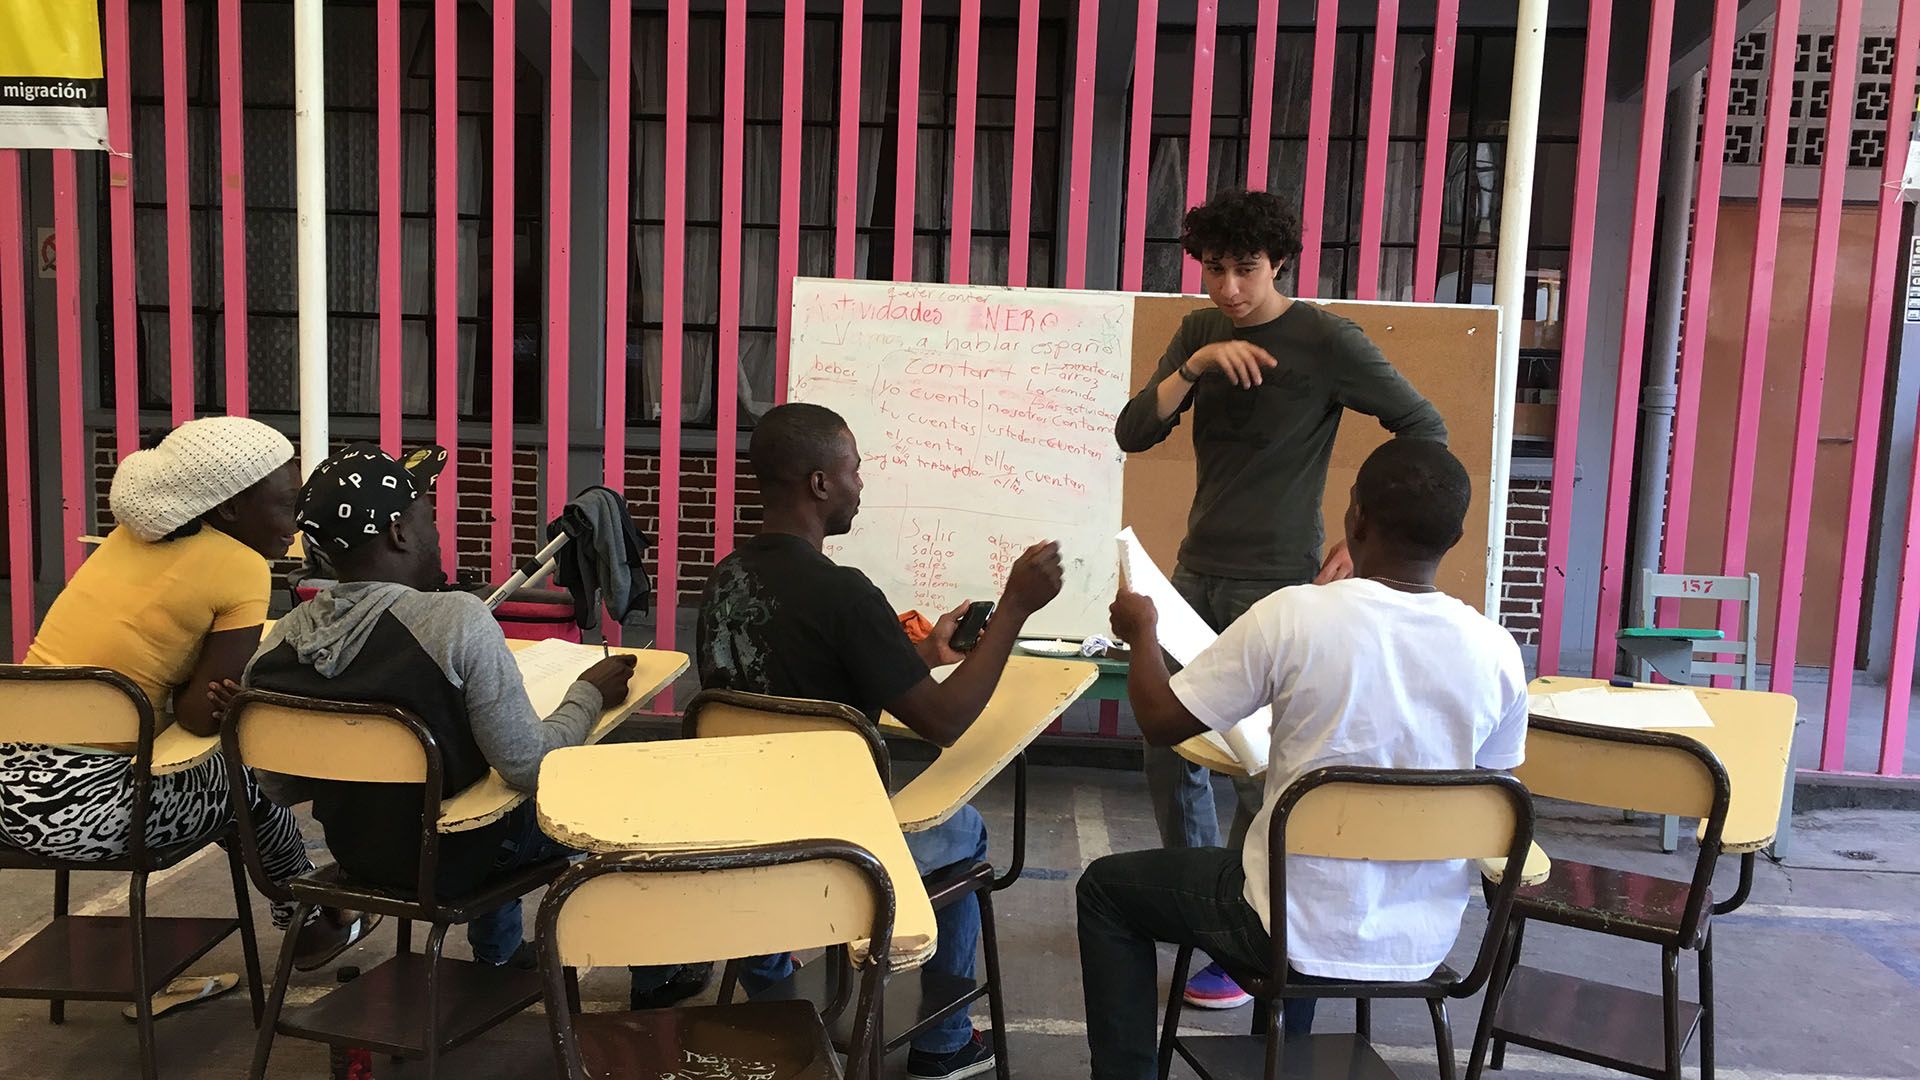 Spanish class migrant shelter hero